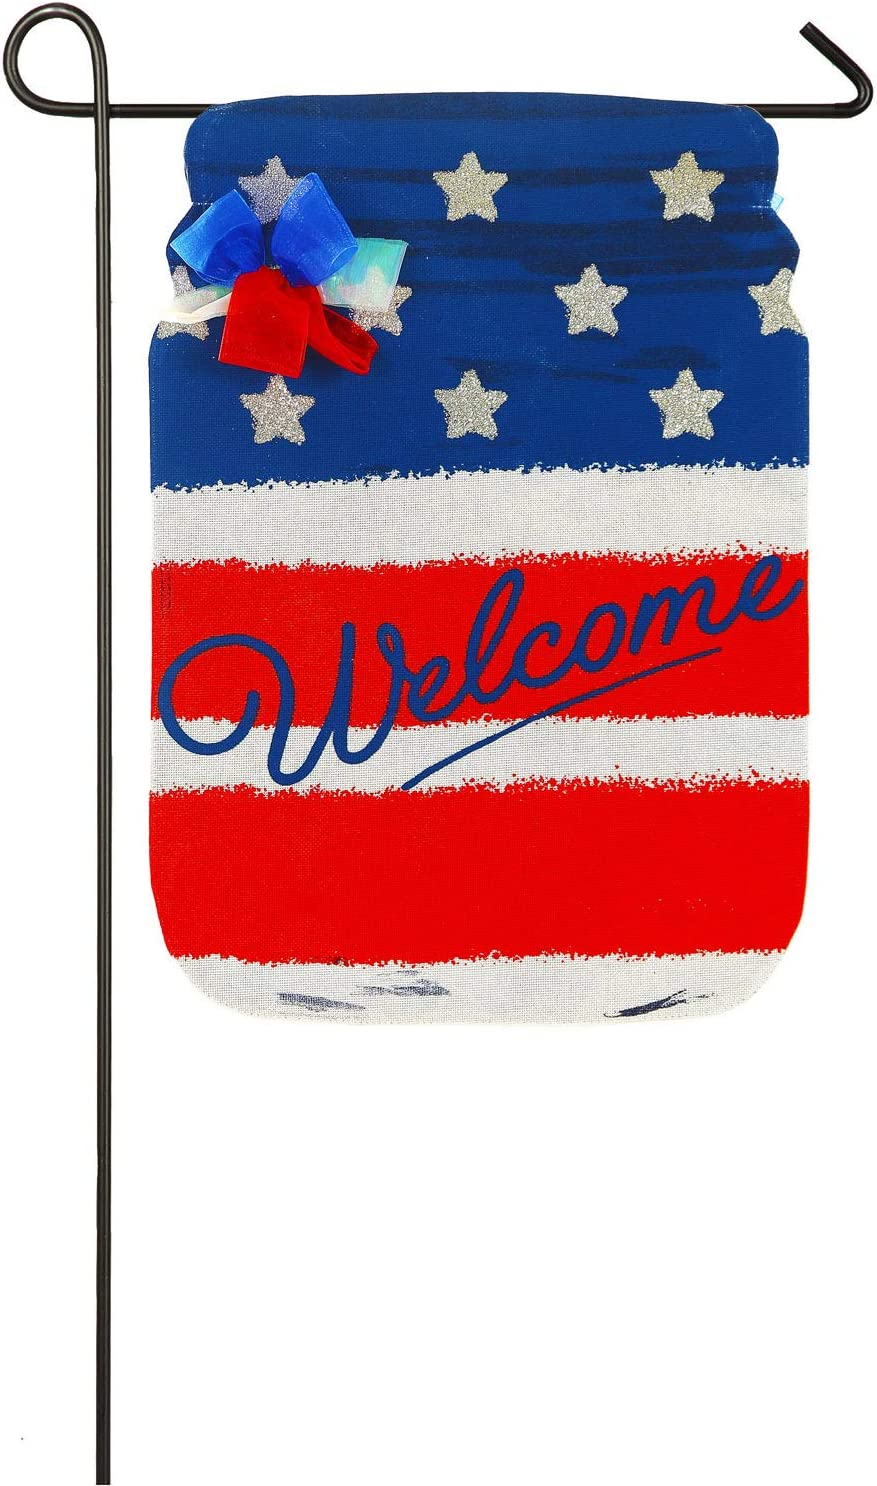 Evergreen Flag Patriotic Mason Jar Burlap Garden Flag - 12.5 x 18 Inches Outdoor Decor for Homes and Gardens